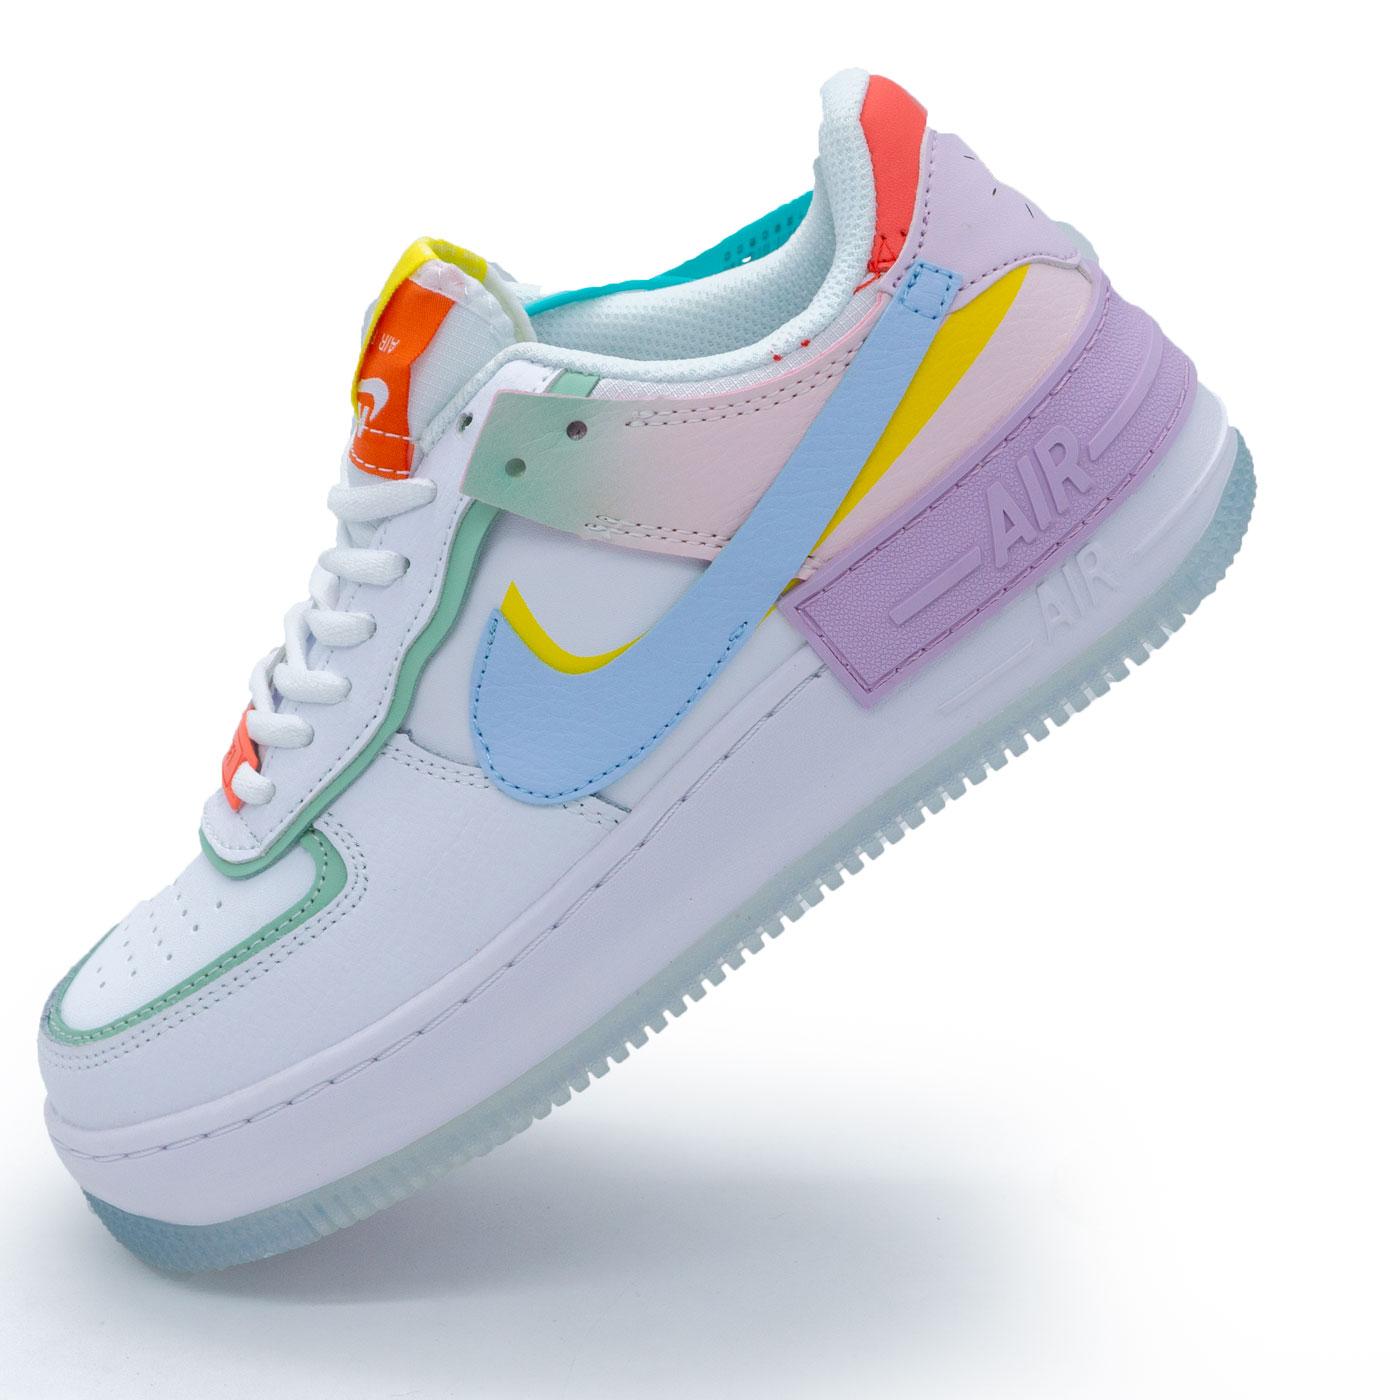 фото main Кроссовки Nike Air Force 1 Shadow бело-голубые - Топ качество main